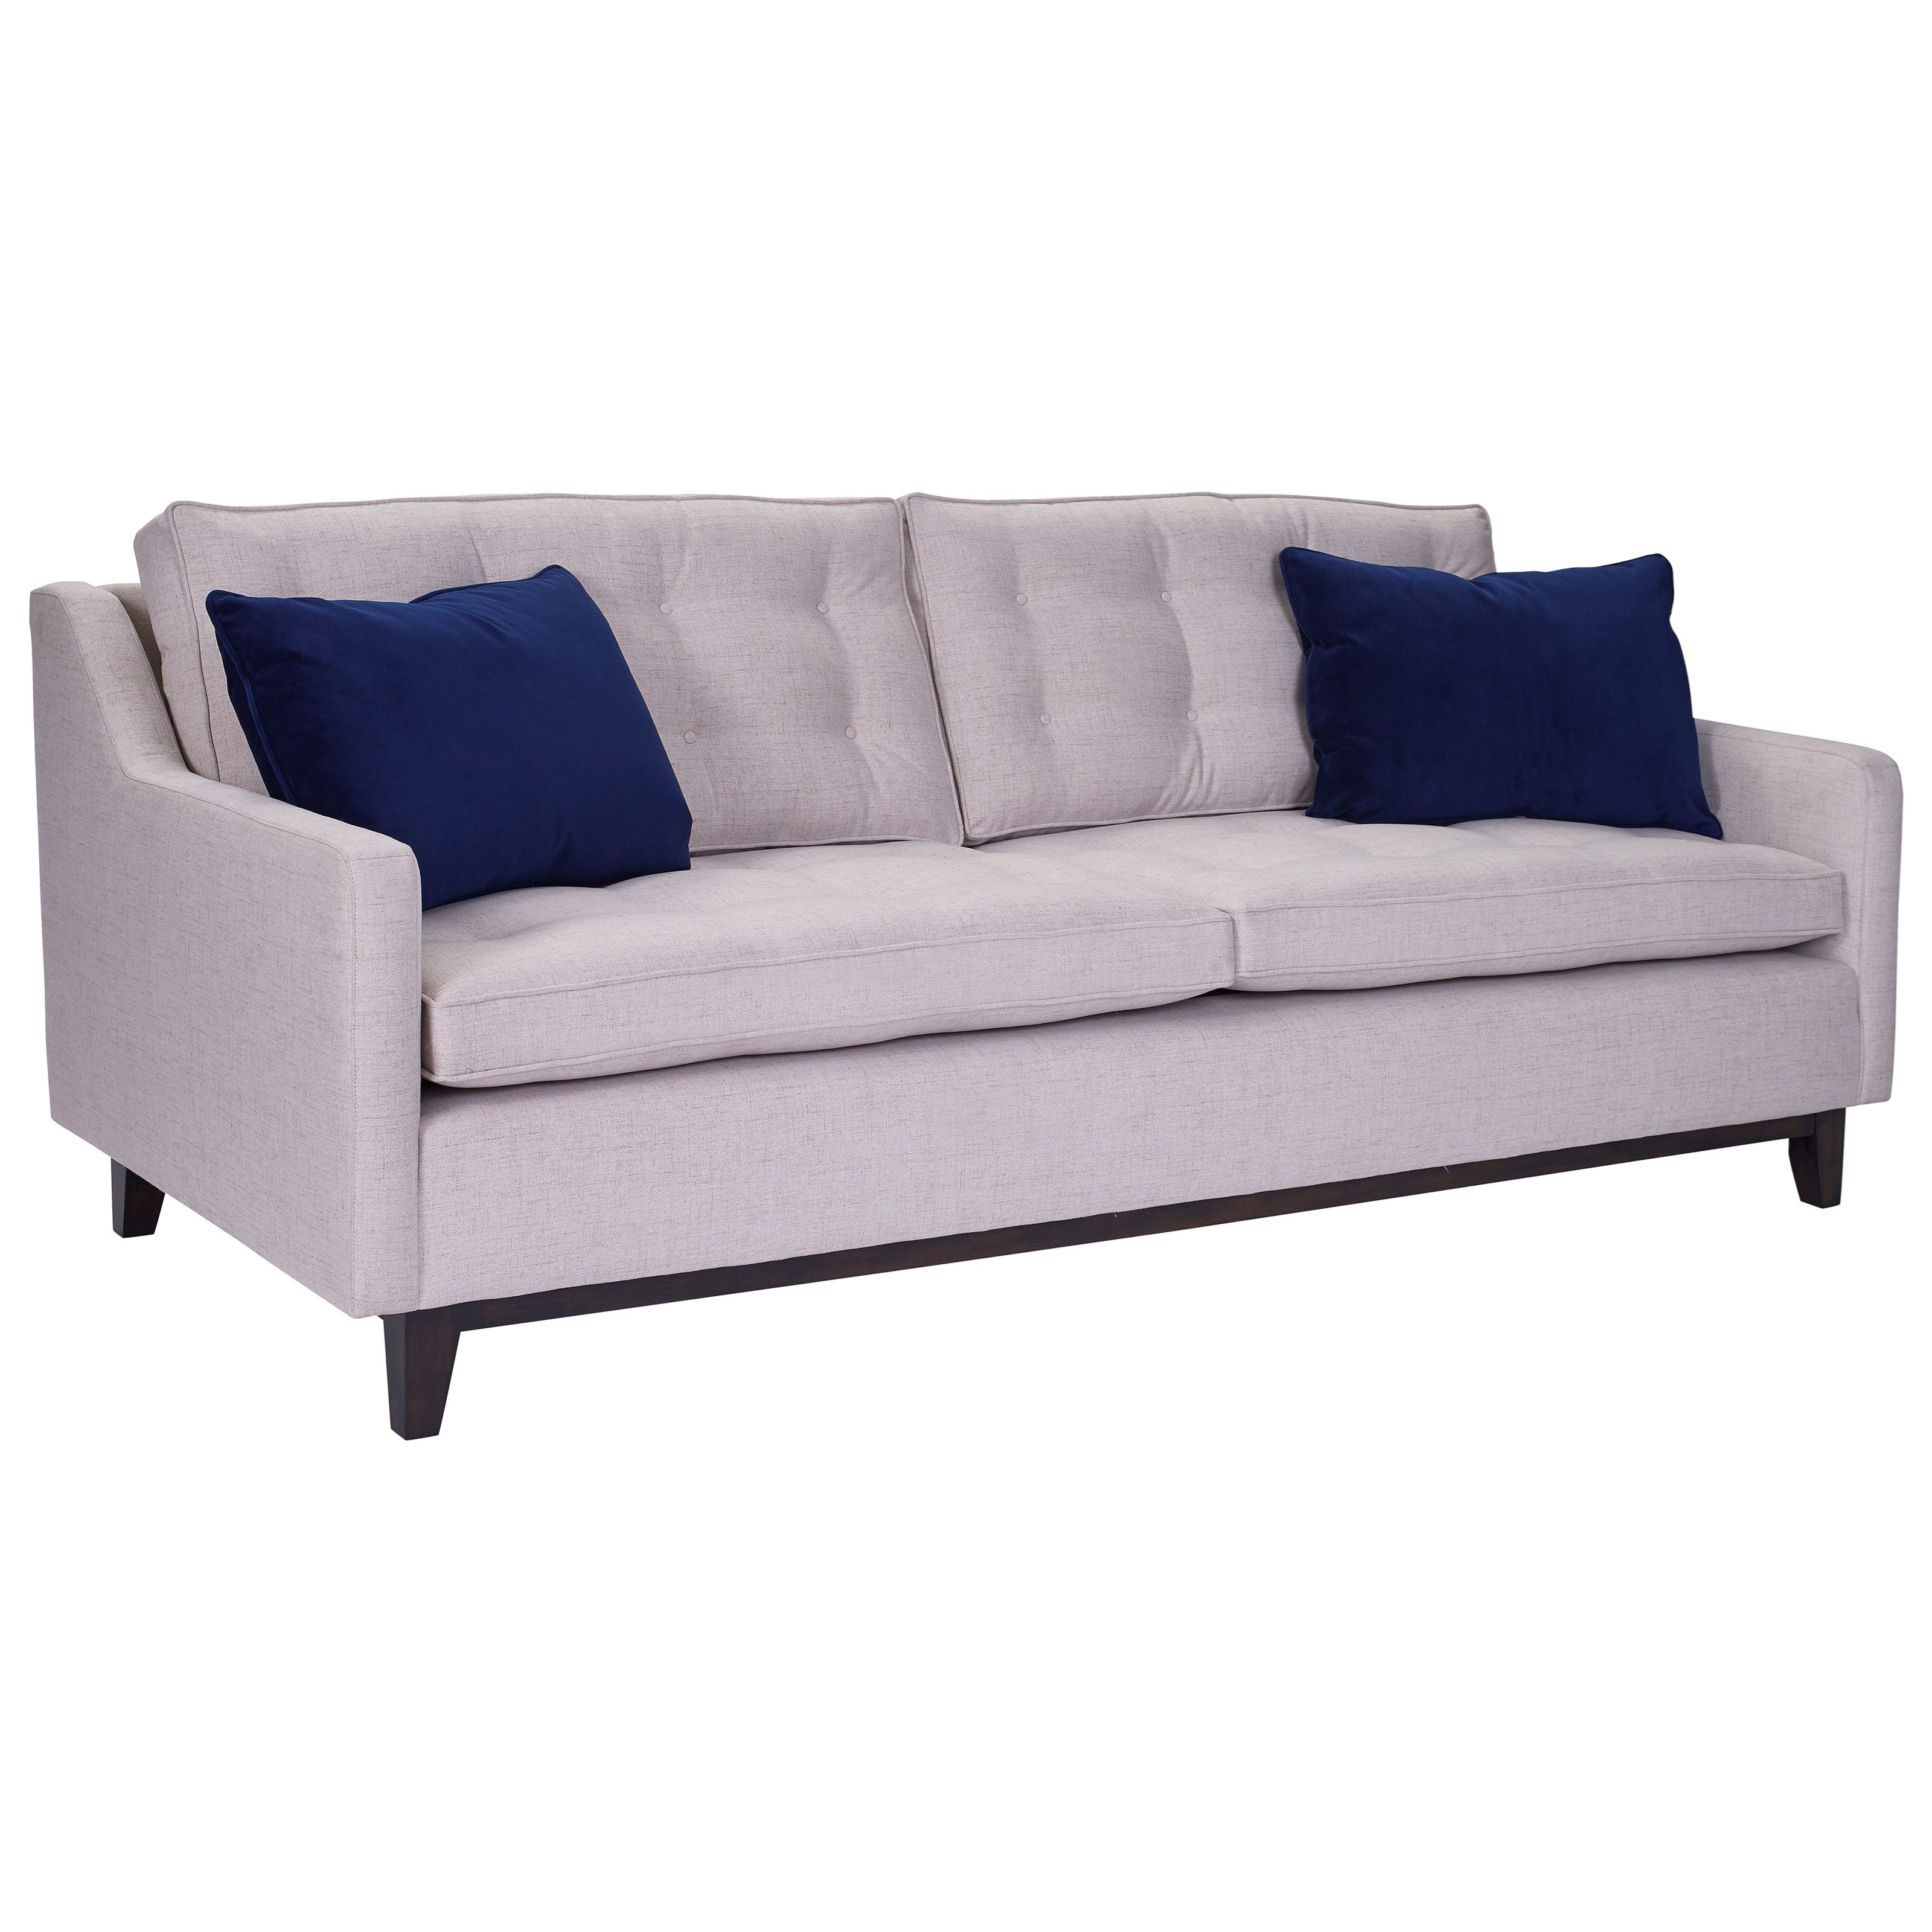 Broyhill furniture tula mid century modern sofa with wood for Mid century modern furniture hawaii